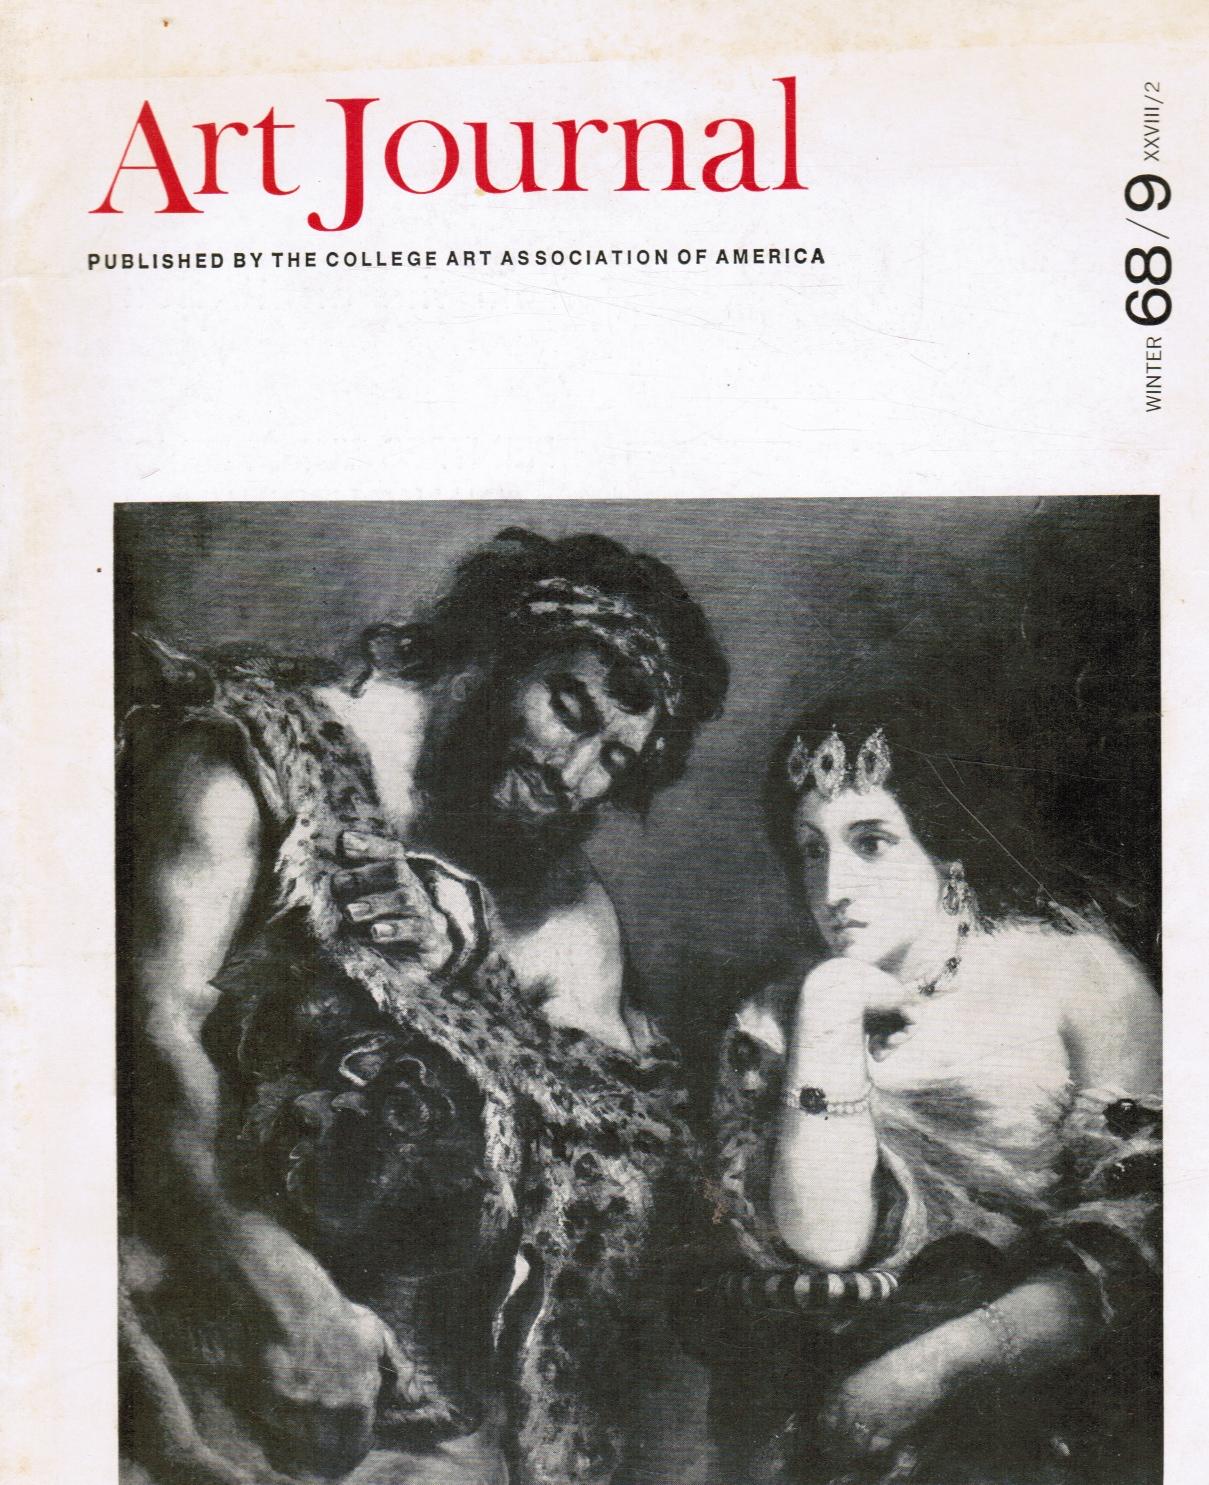 Image for Art Journal: Fall 68 XXVIII/1 Gothic Europe, Sprezzatura, Wilhelm Voge, Jan Van Eyck